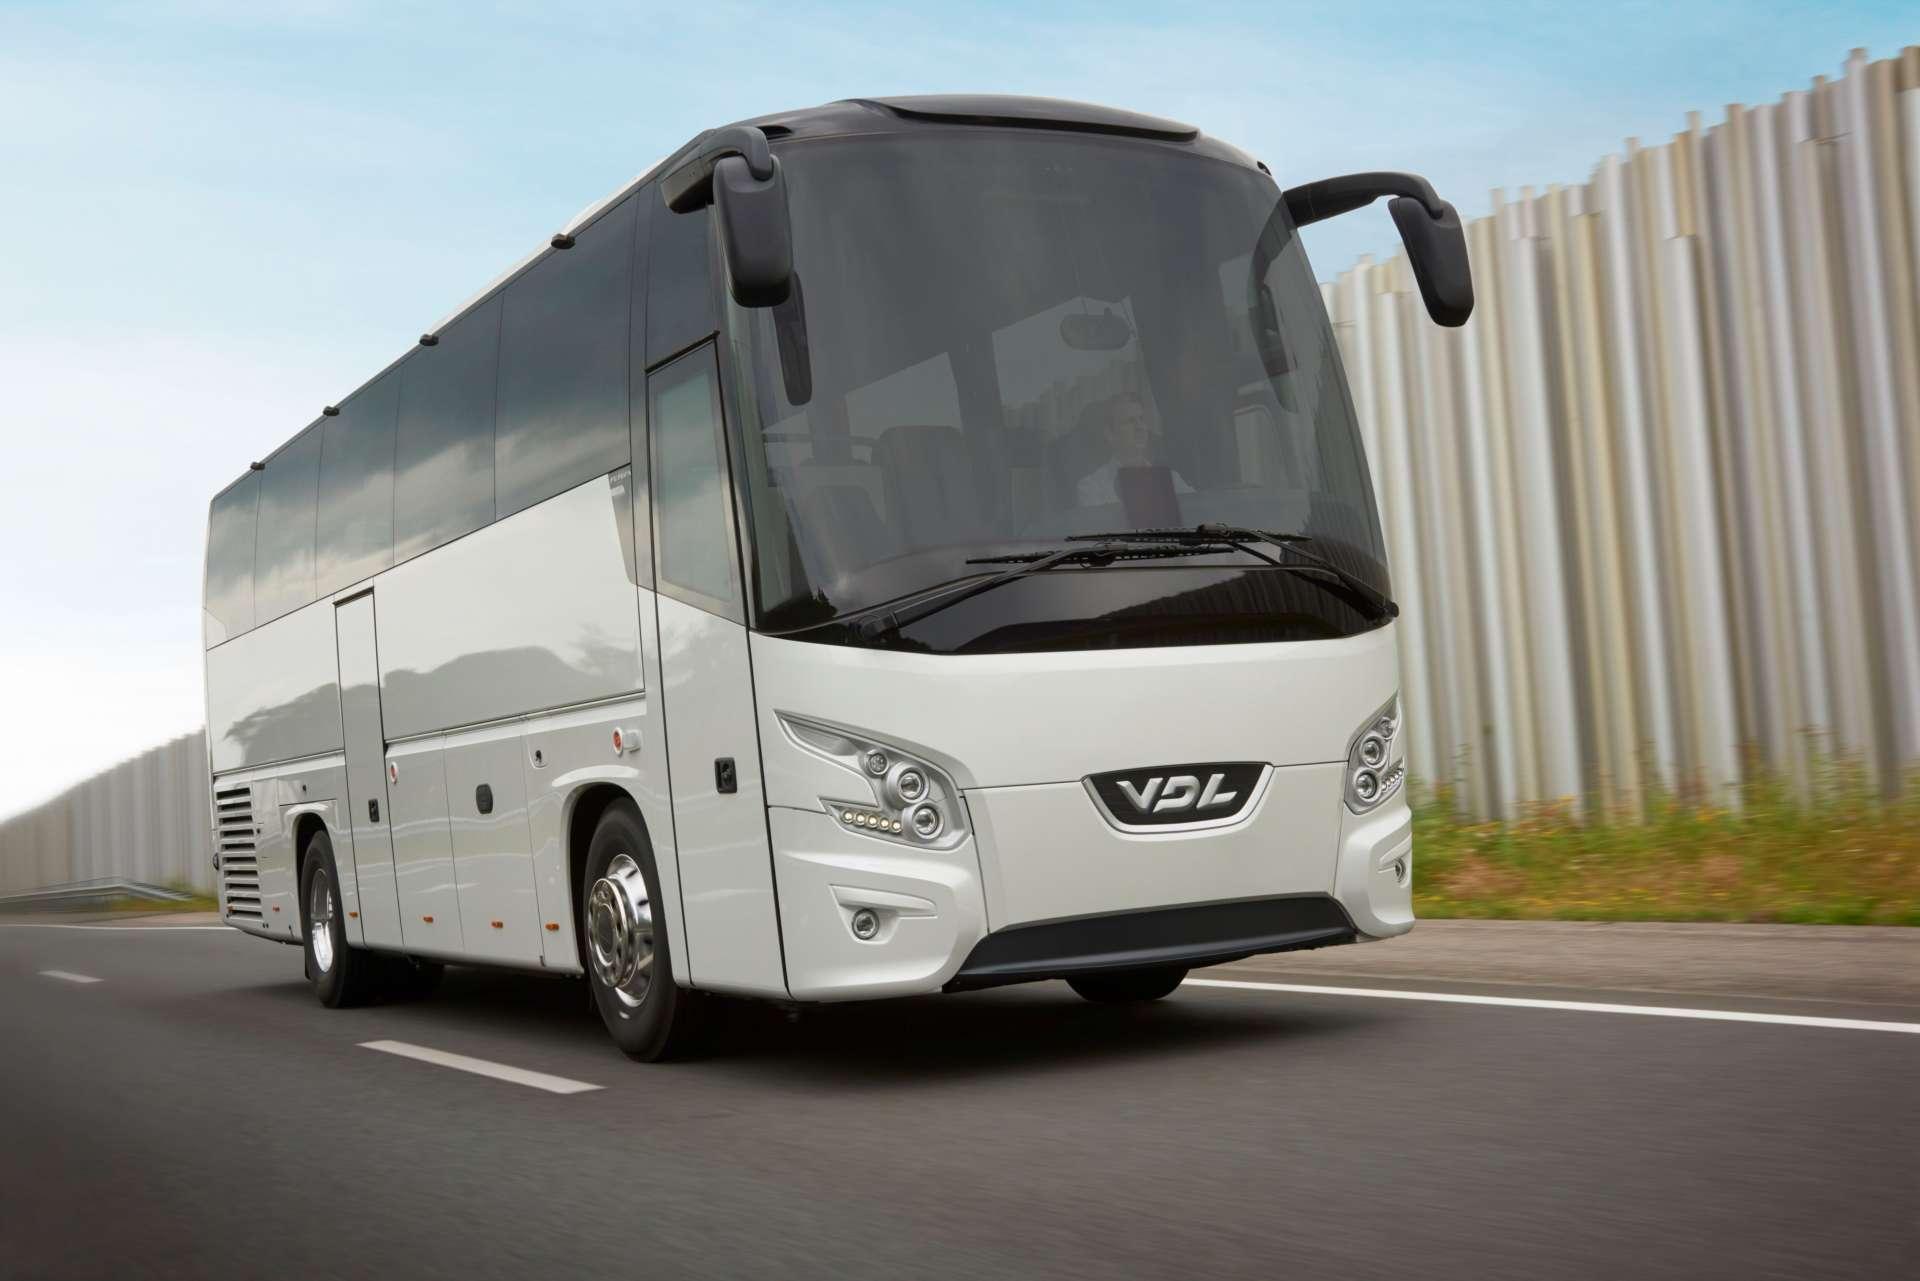 3 Vdl Bus Amp Coach Premieres At Iaa 2016 3 Vdl Bus Amp Coach